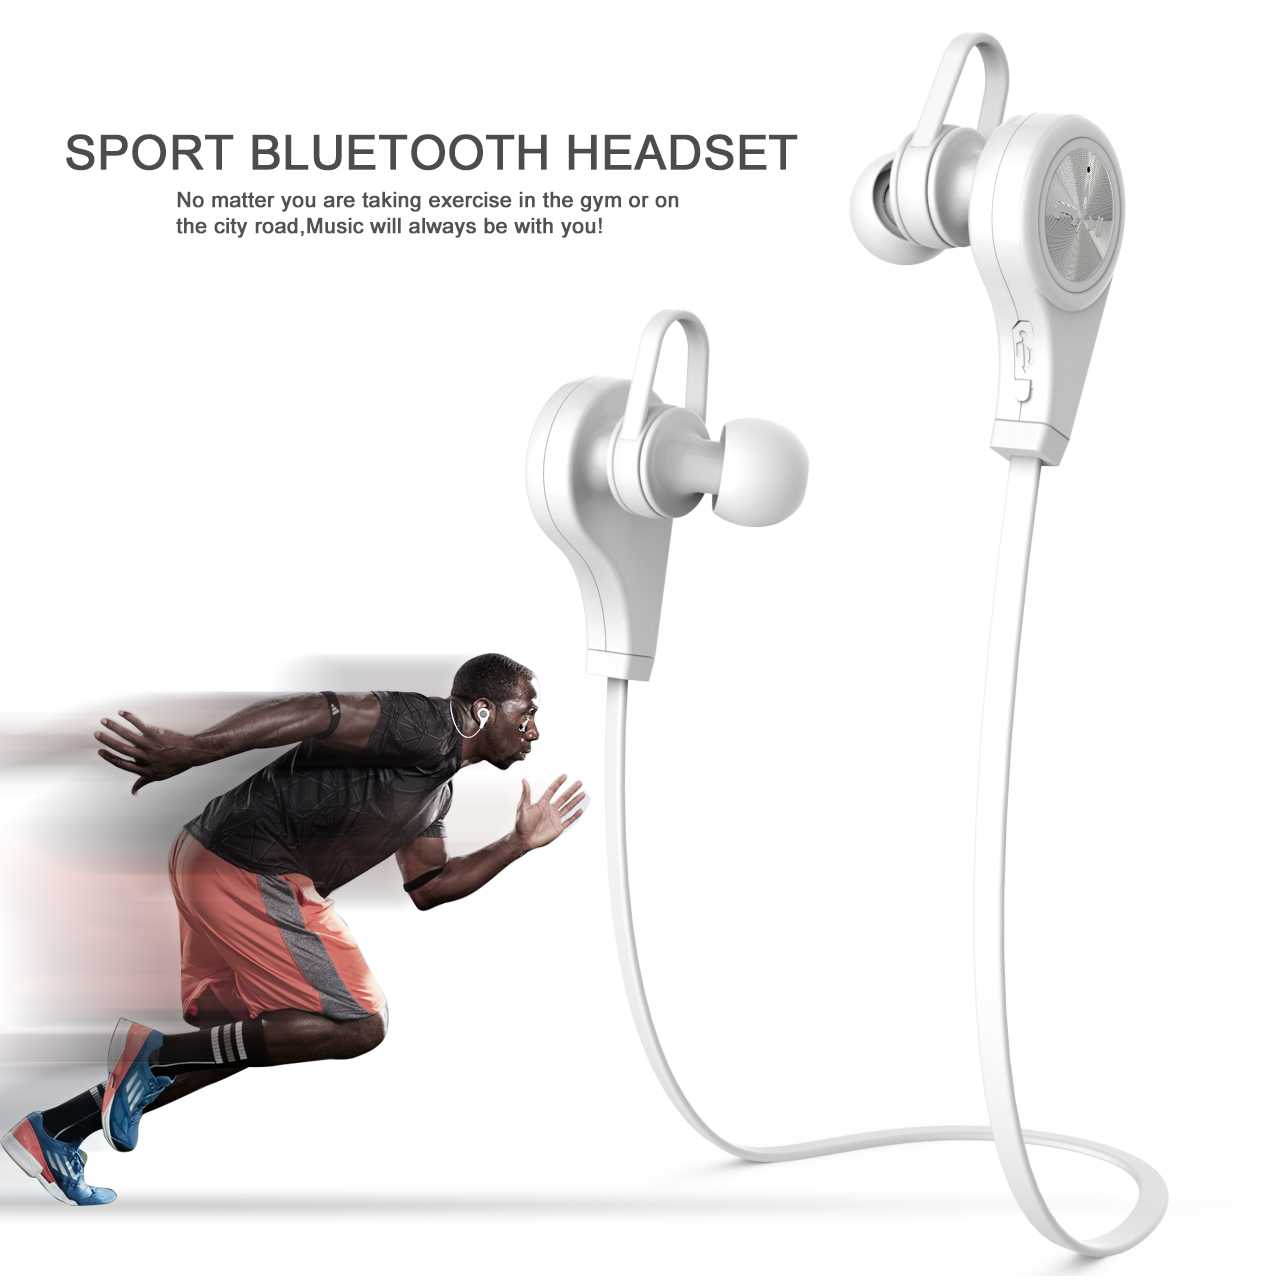 Bluetooth Earphone Headphone Q9 Microphone Stereo Wireless Sports Headset Bluetooth 4.1 for Xiaomi Iphone smart watch A1 DZ09(China (Mainland))